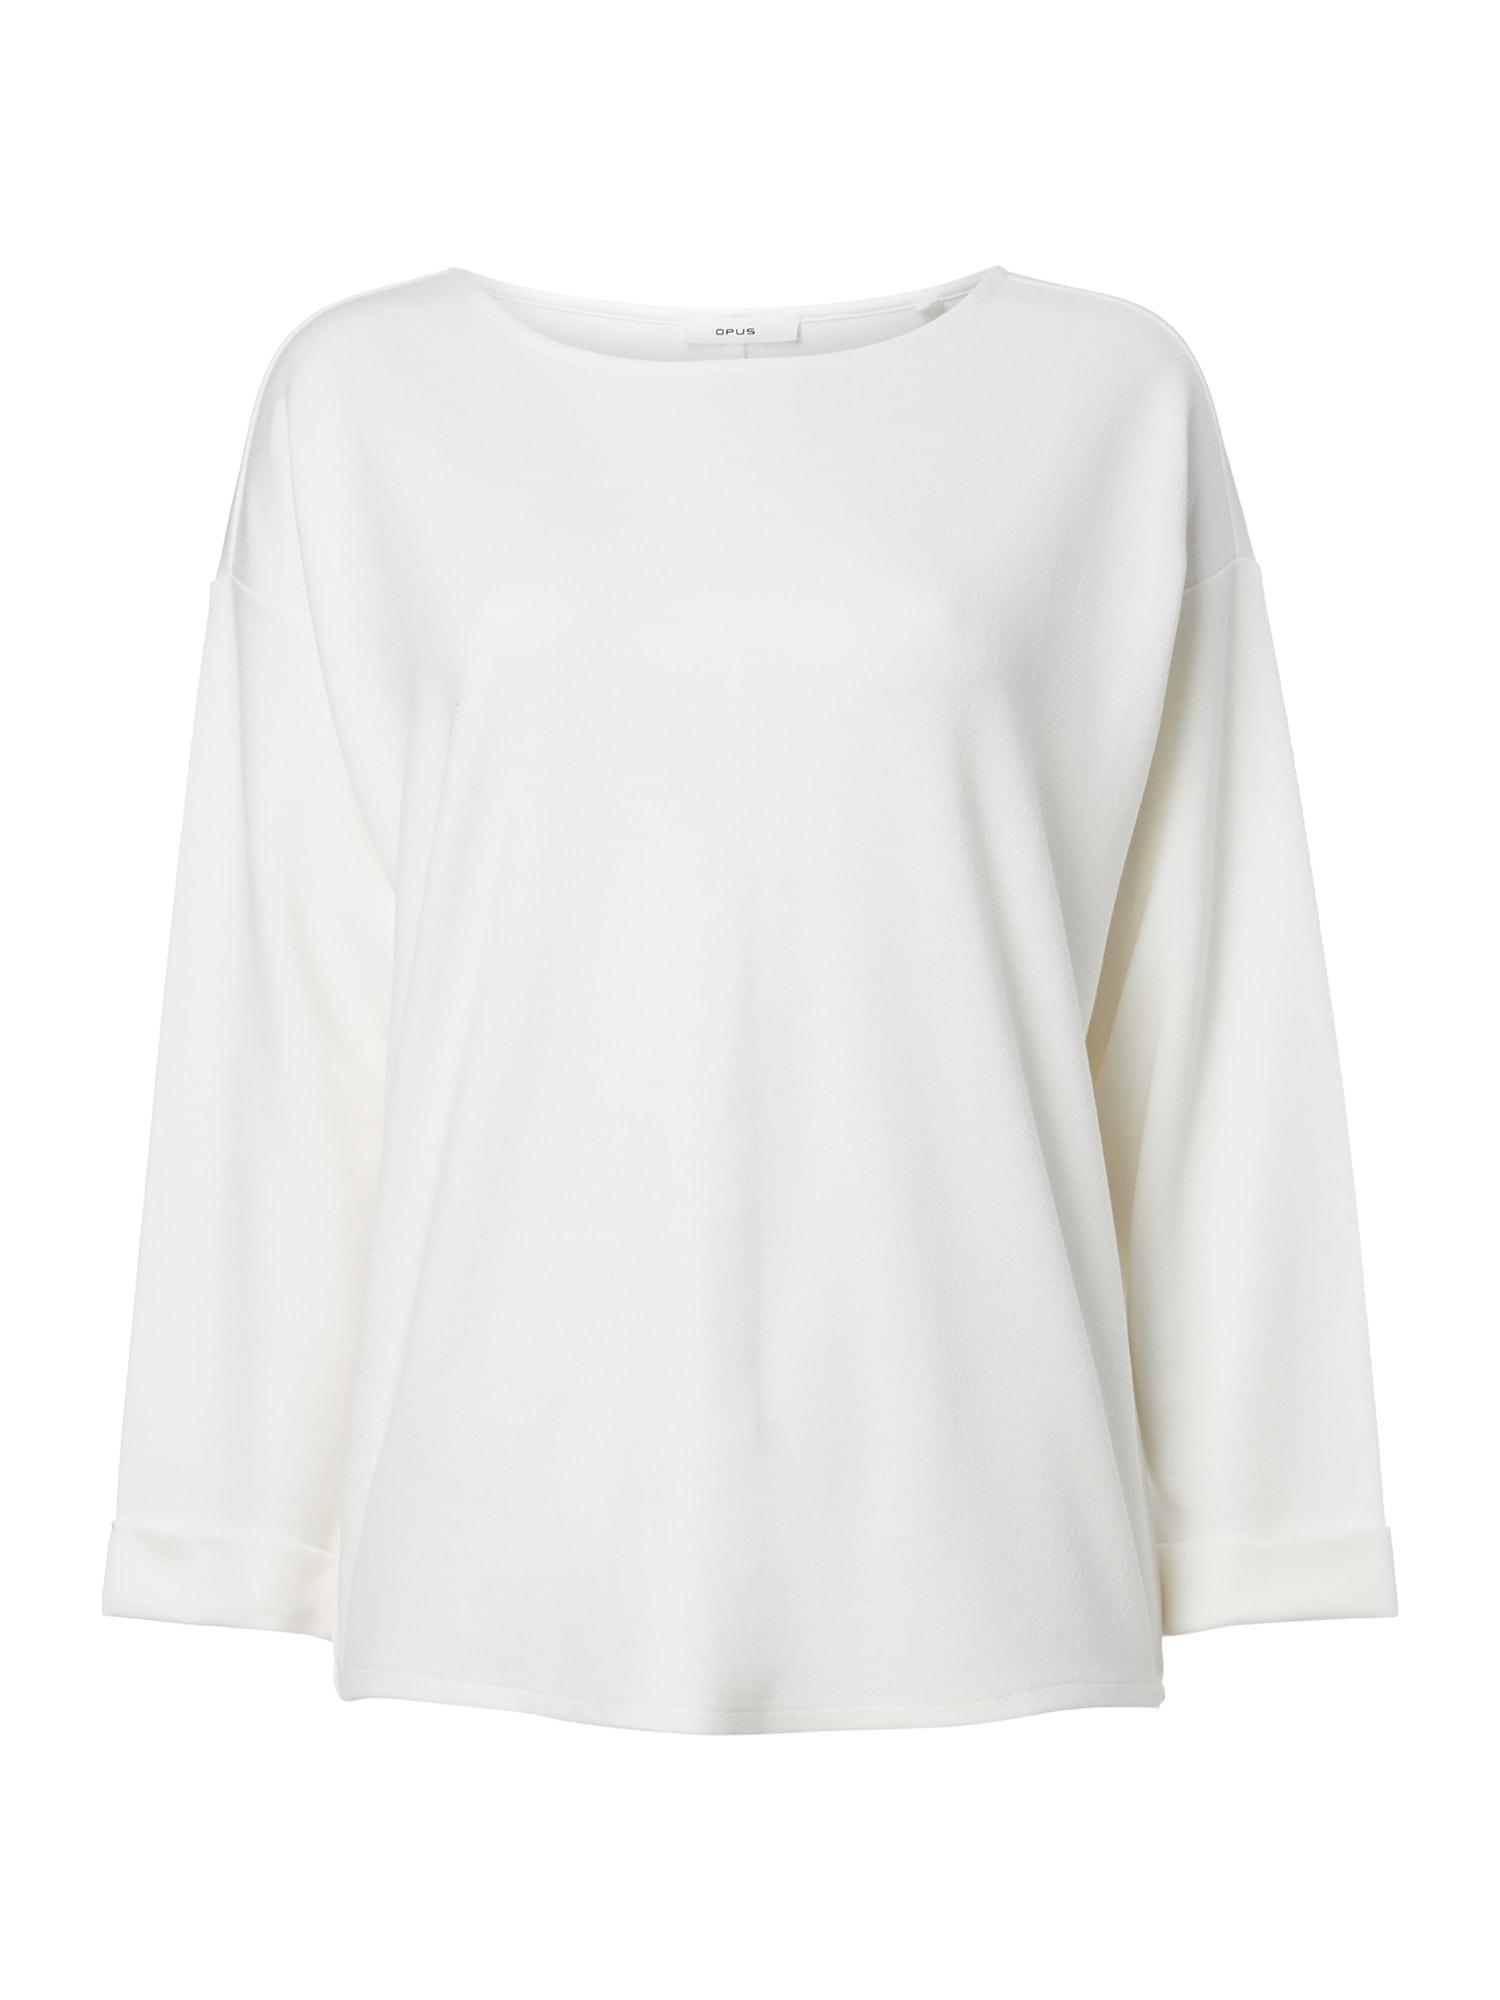 13 Perfekt Online Kleidung Bestellen StylishDesigner Erstaunlich Online Kleidung Bestellen Spezialgebiet